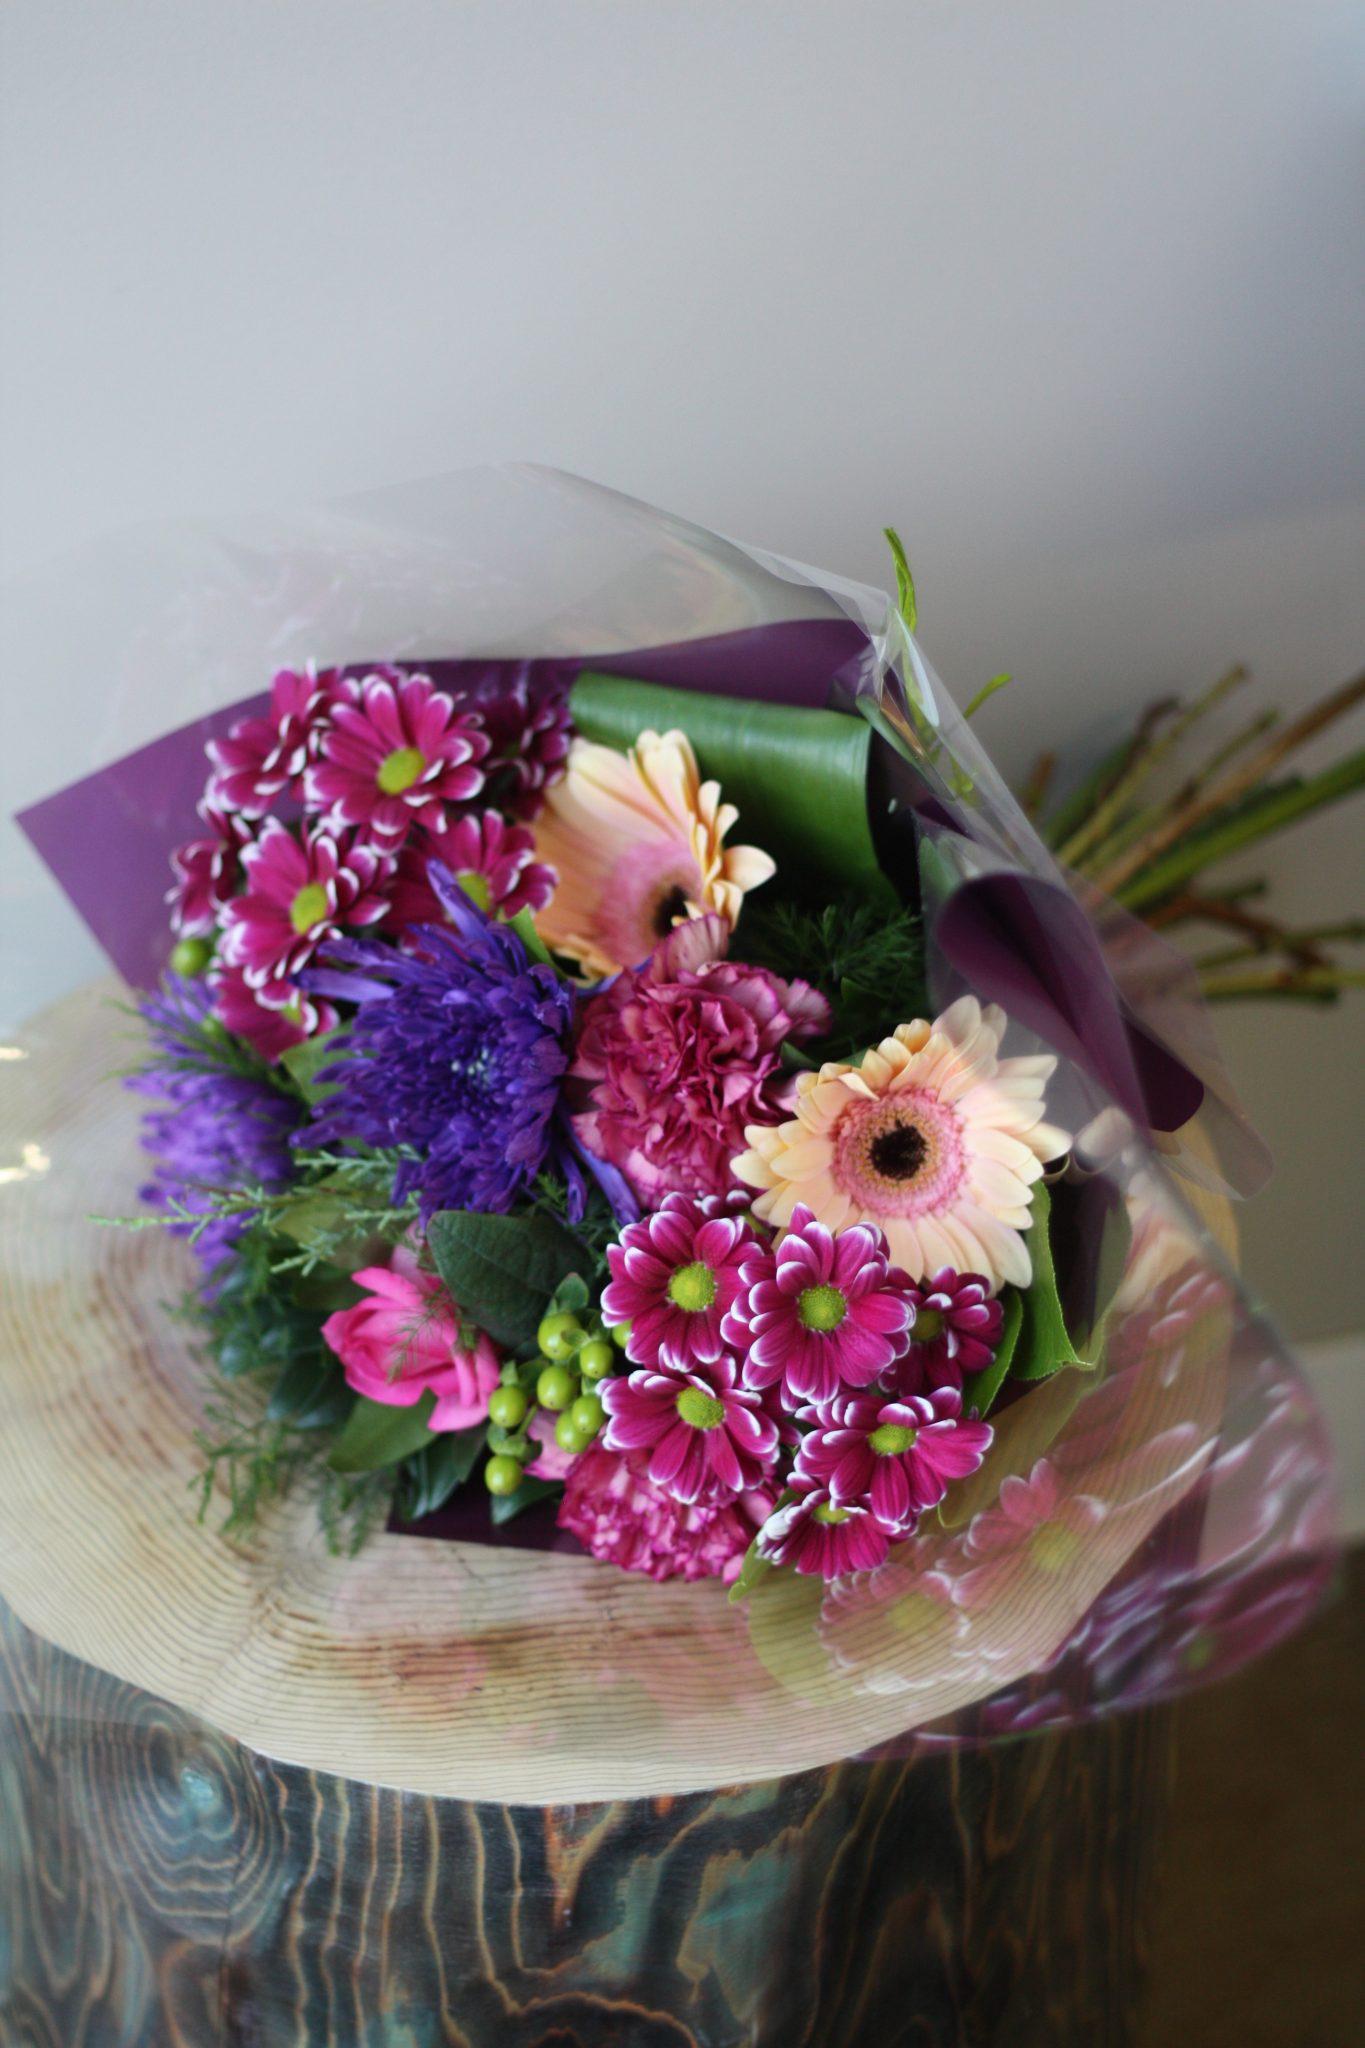 Flower Shop West Kelowna | Passionate Blooms Floral Design | custom hand-tied bouquet